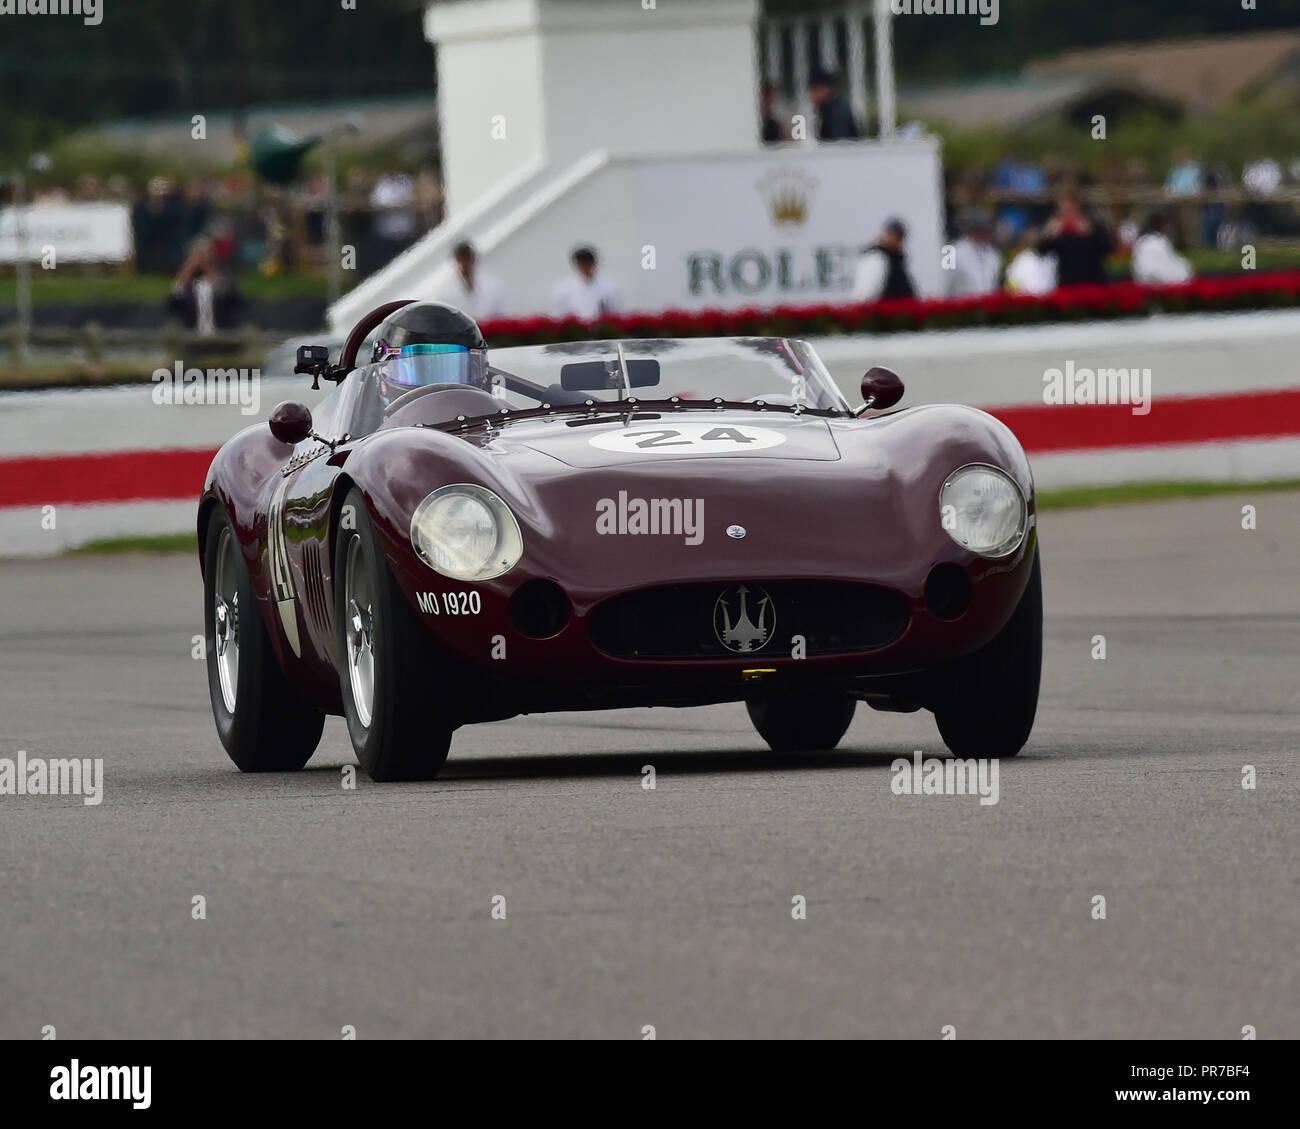 Martin Halusa, Maserati 300S, Freddie März Memorial Trophy, Sportwagen, 1952 bis 1955, Goodwood Revival 2018, September 2018, Automobile, Autos, Circ. Stockbild